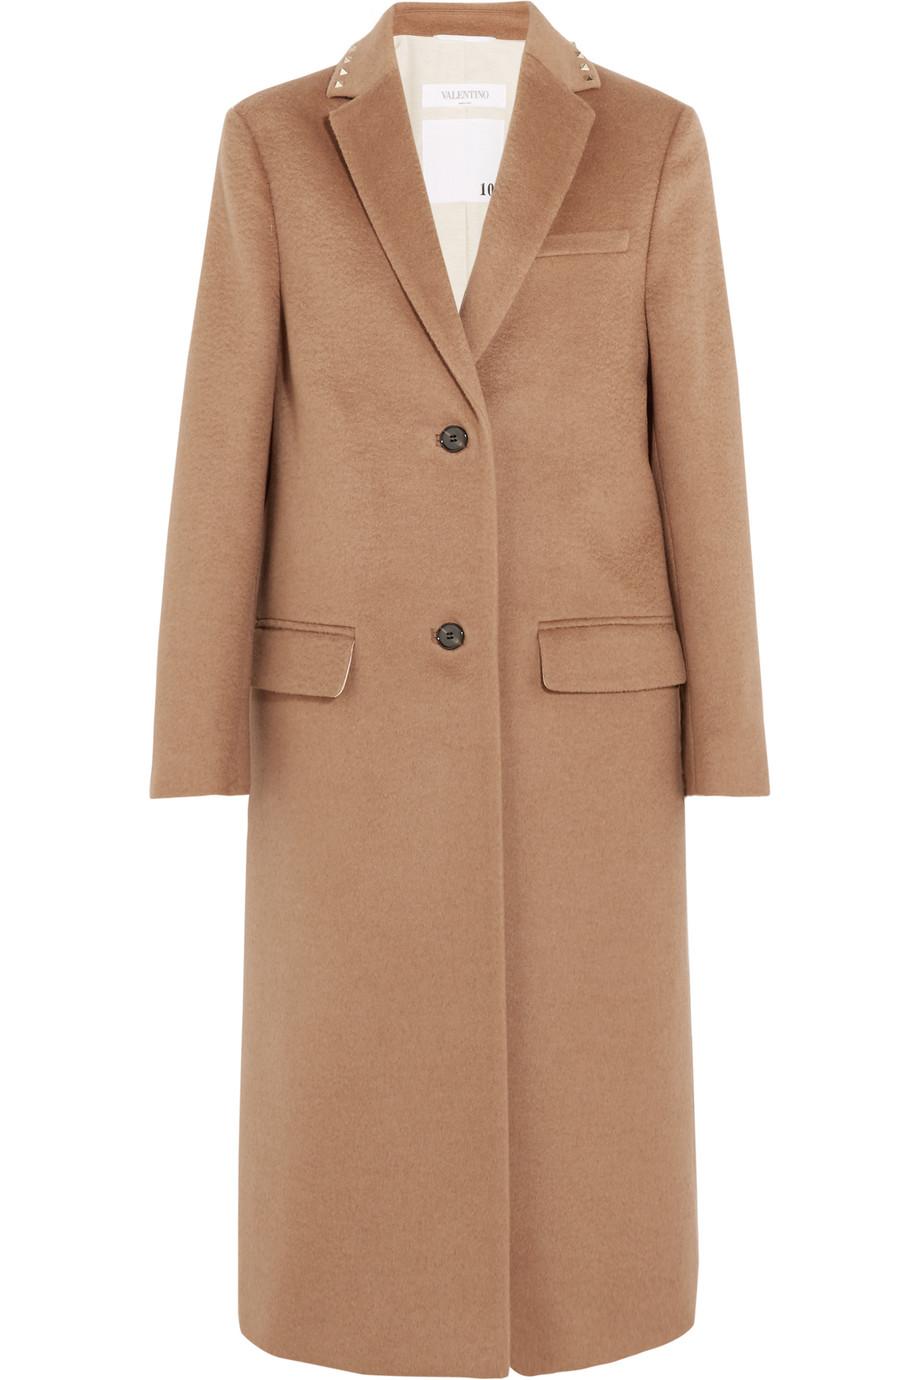 Valentino Stud-Embellished Camel Hair Coat, Tan, Women's, Size: 44